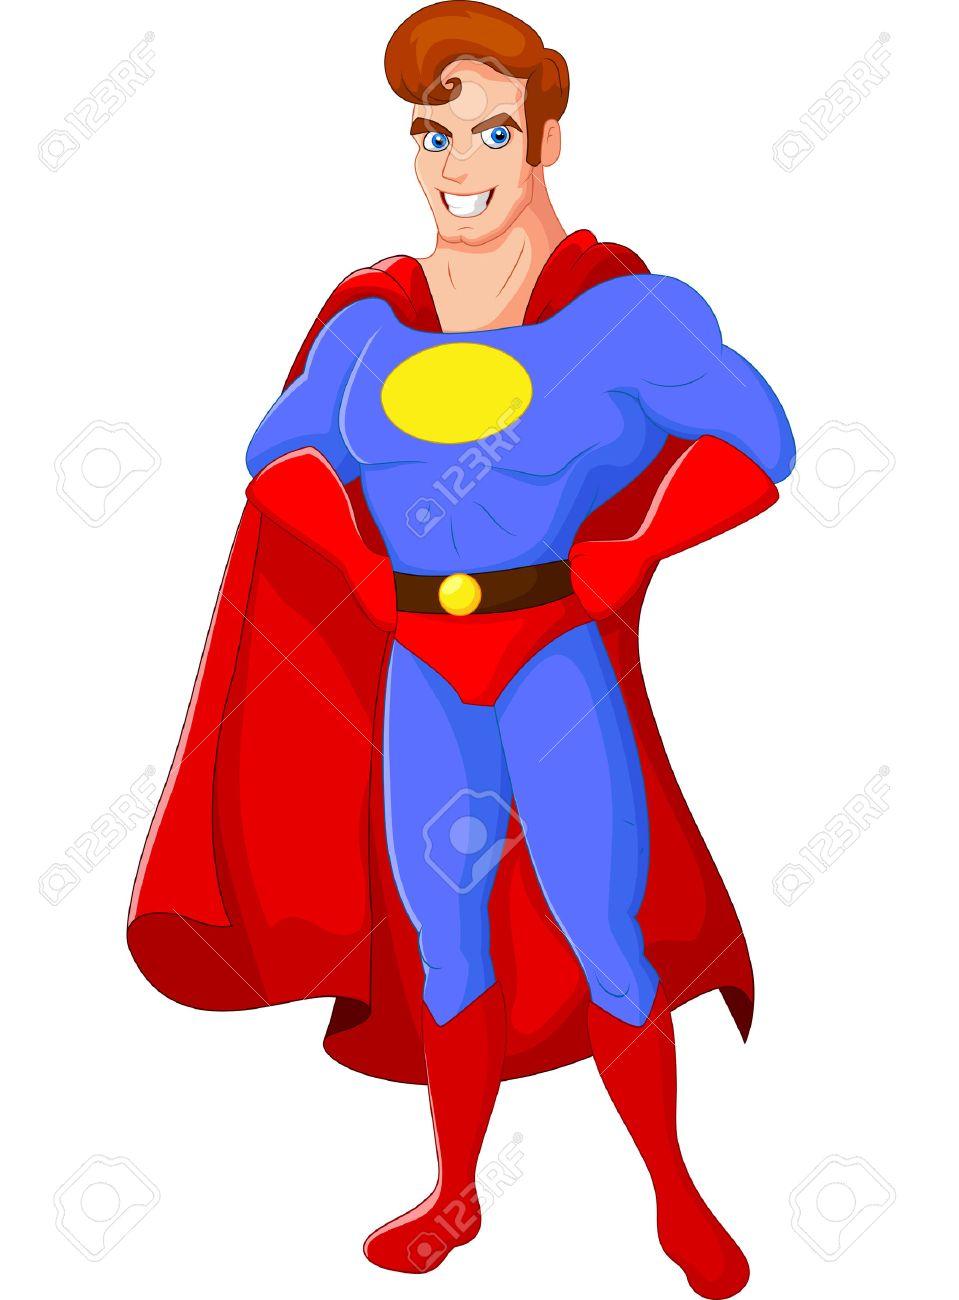 Cartoon Male Superhero Posing Royalty Free Cliparts Vectors And Stock Illustration Image 37538353